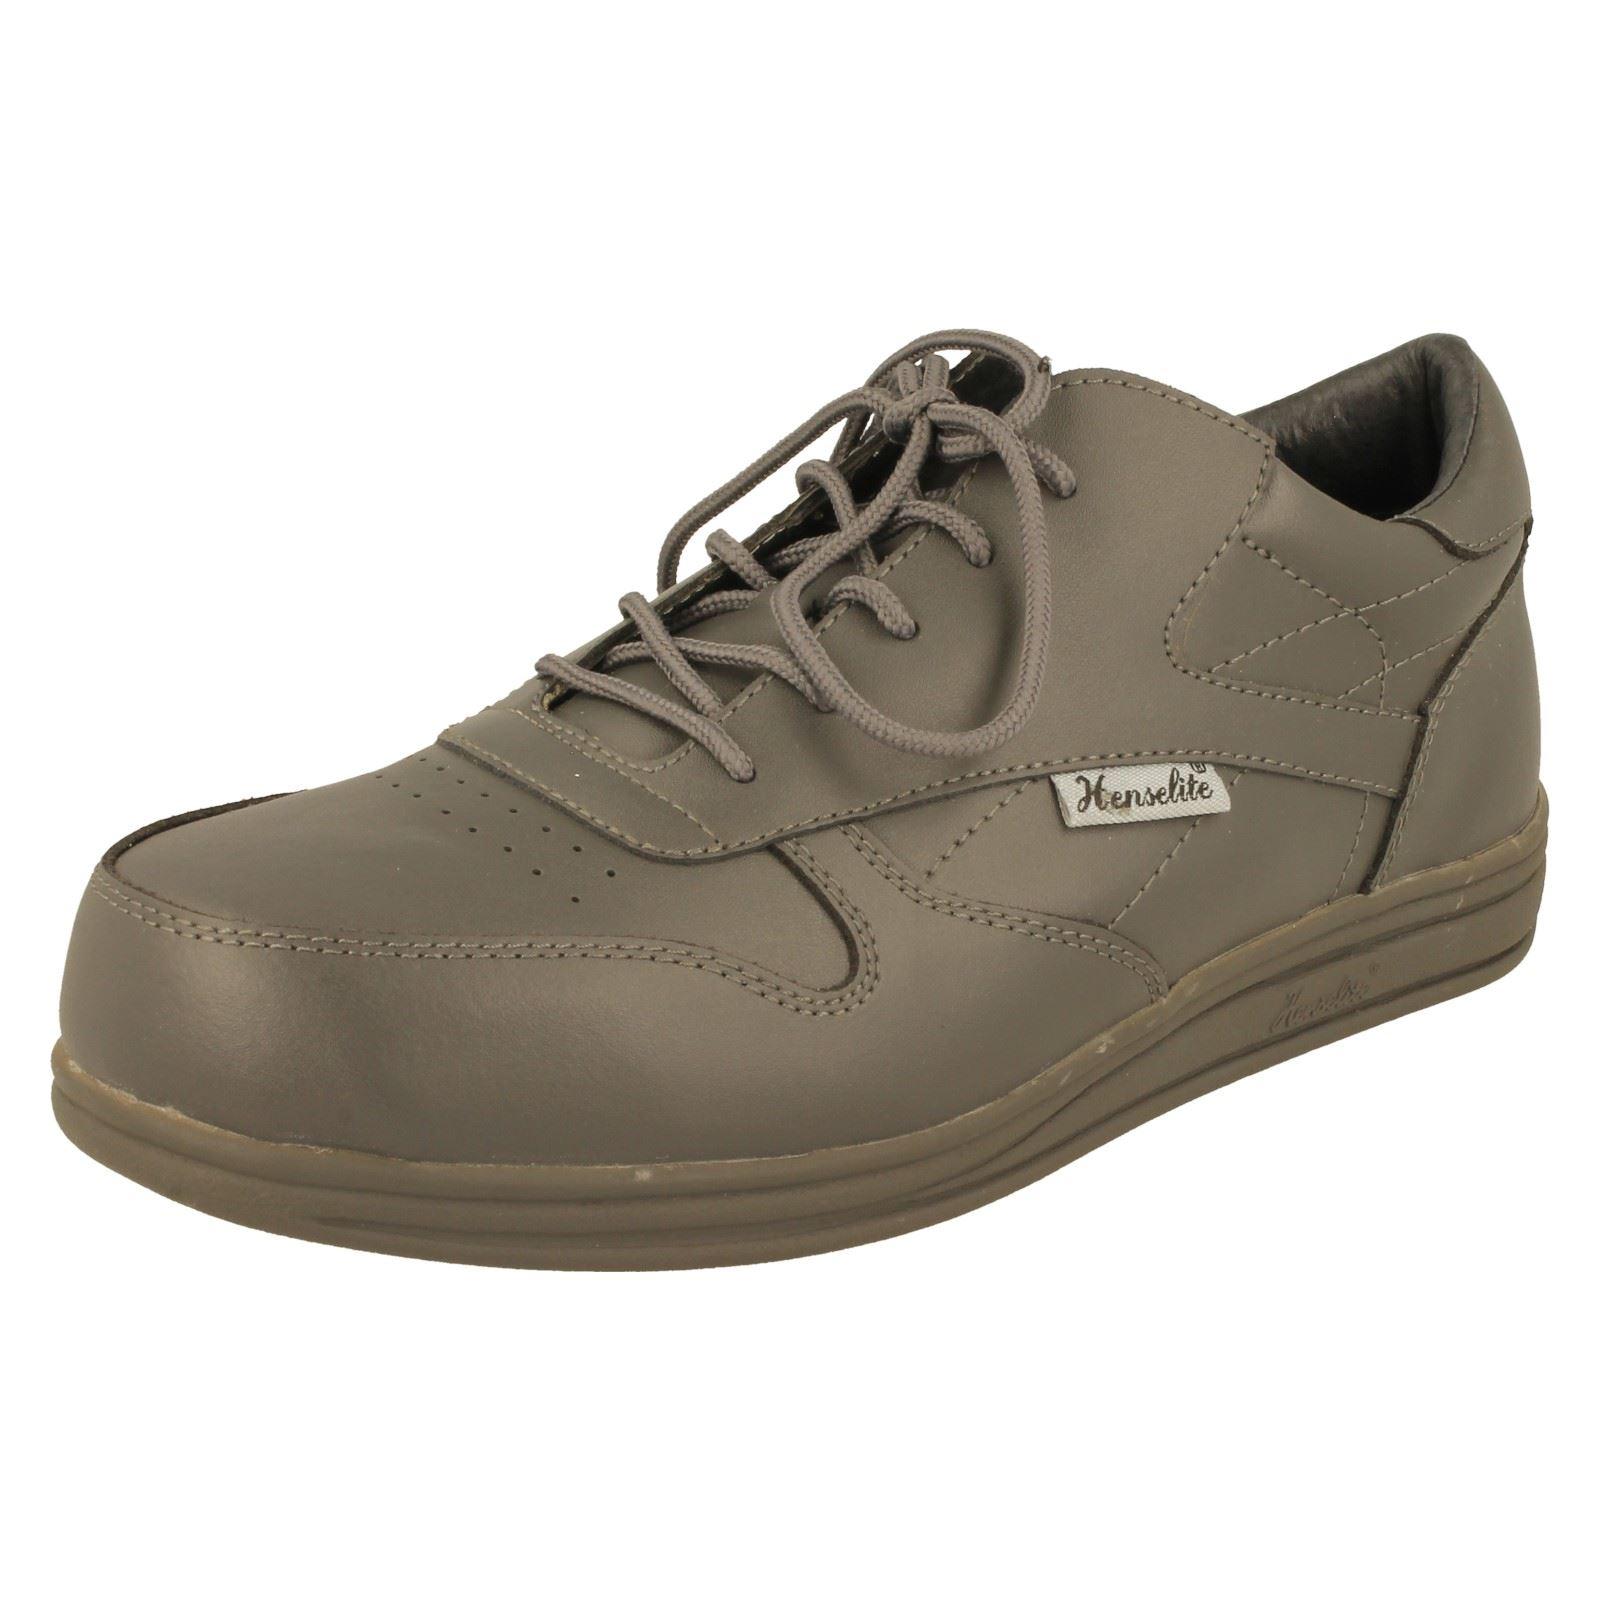 Henselite Mens Bowling Shoes